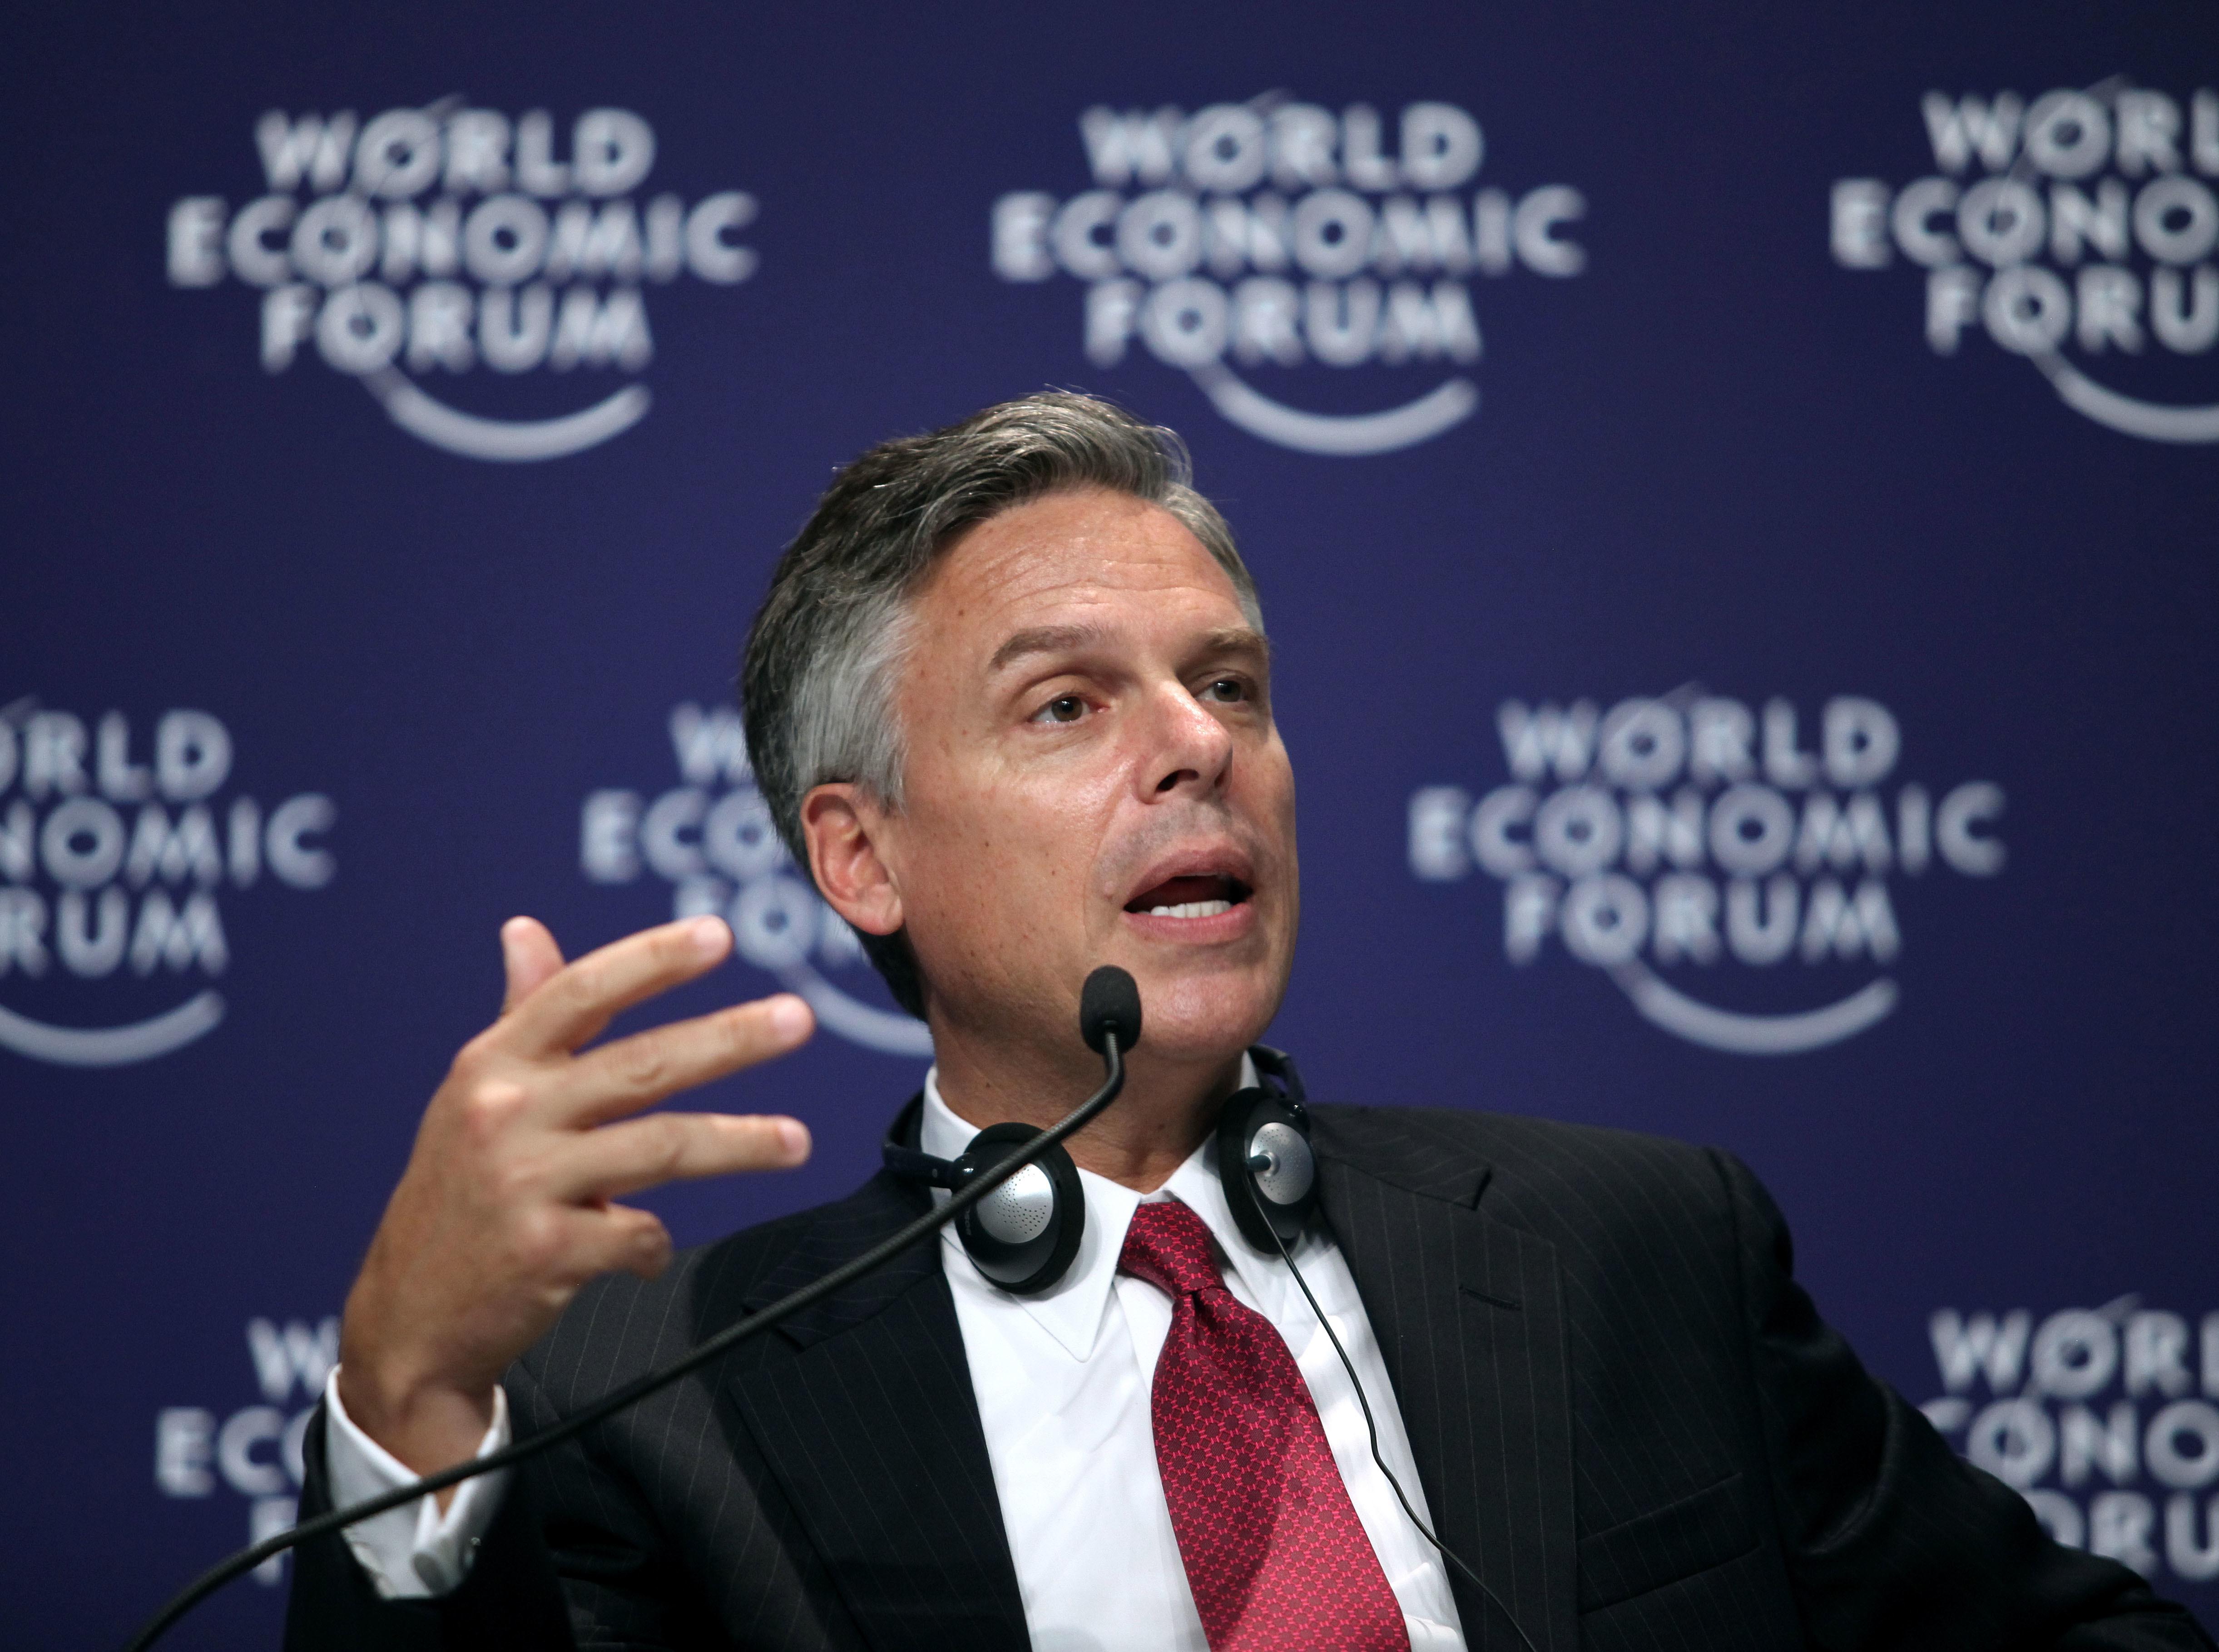 "<p>Джон Хантсман. Фото: &copy;Flickr/<a href=""https://www.flickr.com/photos/worldeconomicforum/"" title=""Go to World Economic Forum's photostream"" data-track=""attributionNameClick"">World Economic Forum</a></p>"